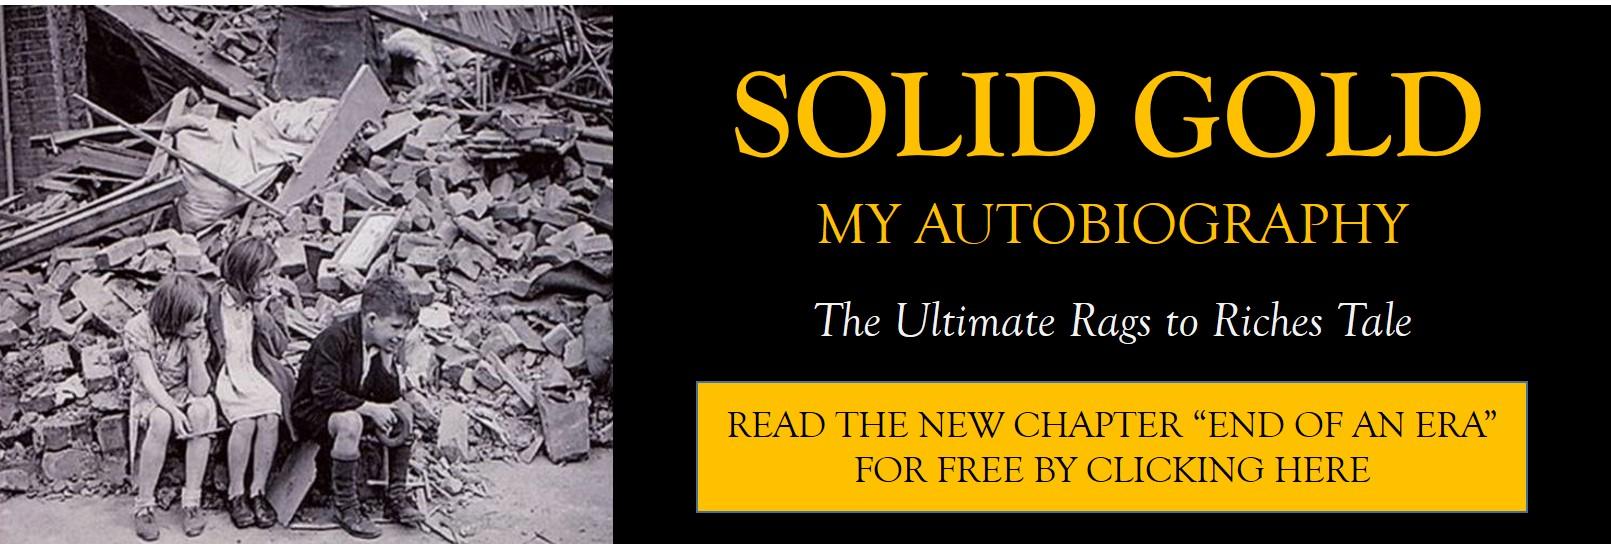 David Gold Free Autobiography